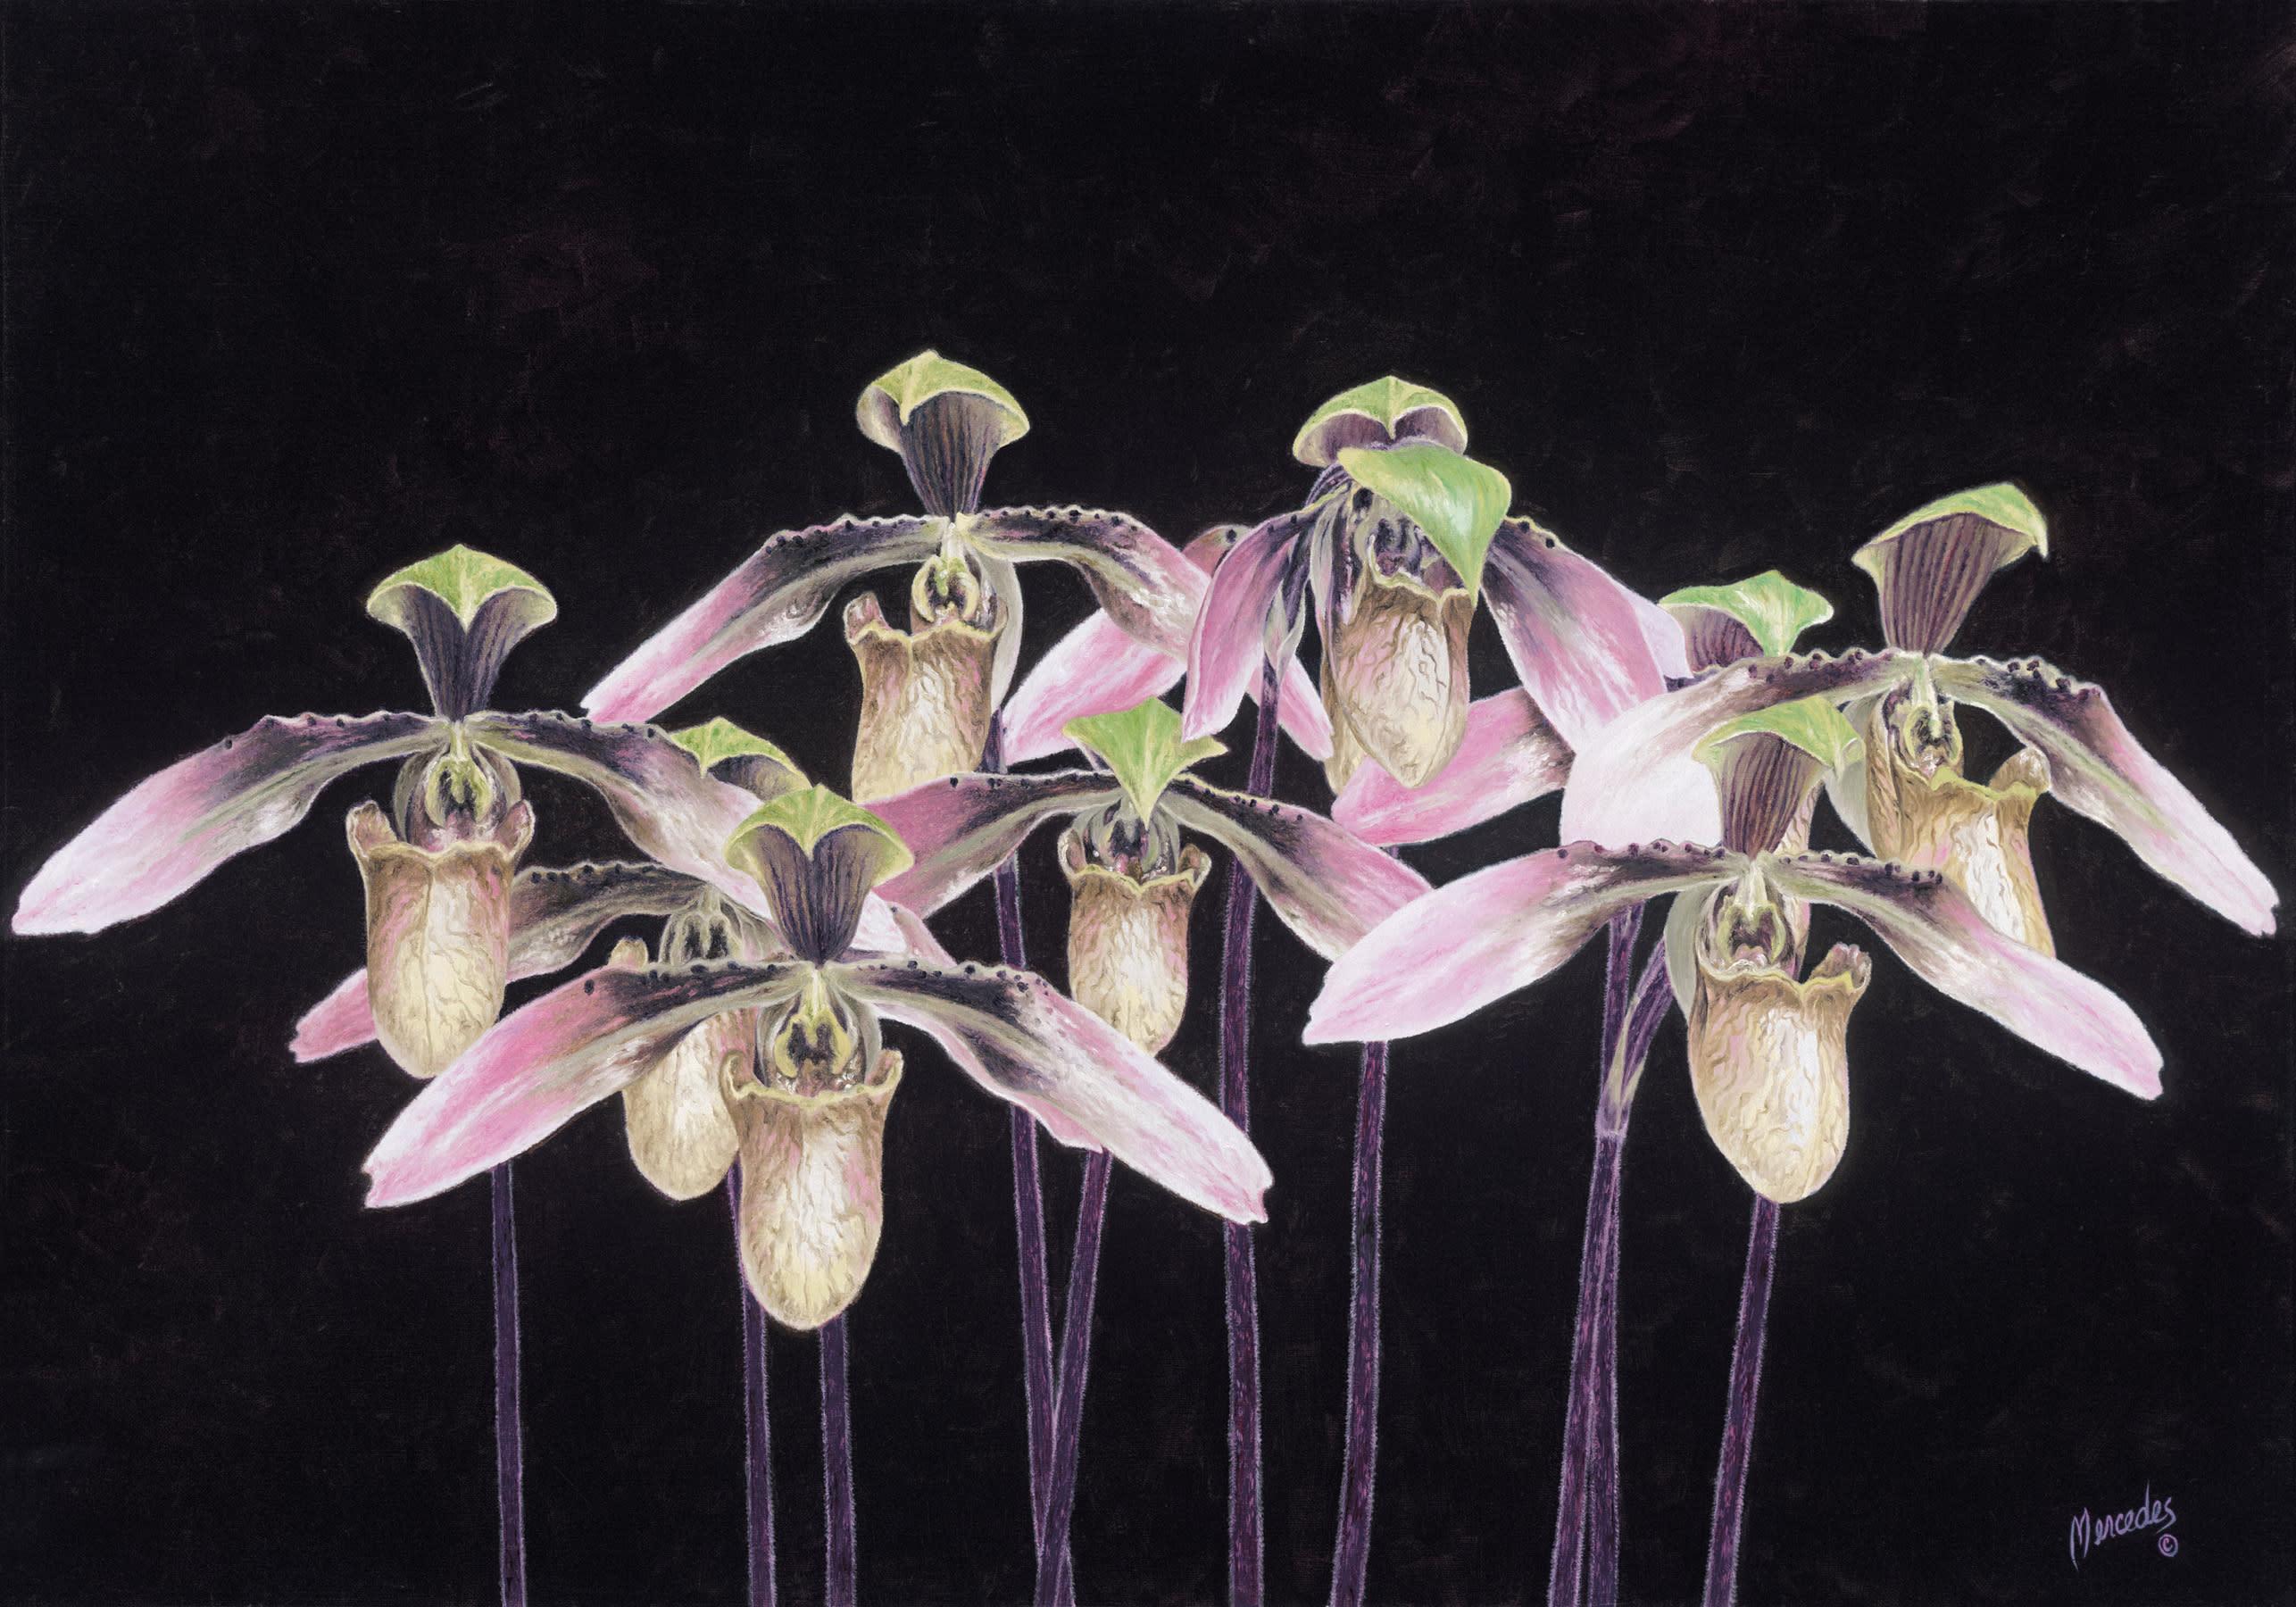 Orchids  by gailoyer mercedes oil14hx20w  rpyssh